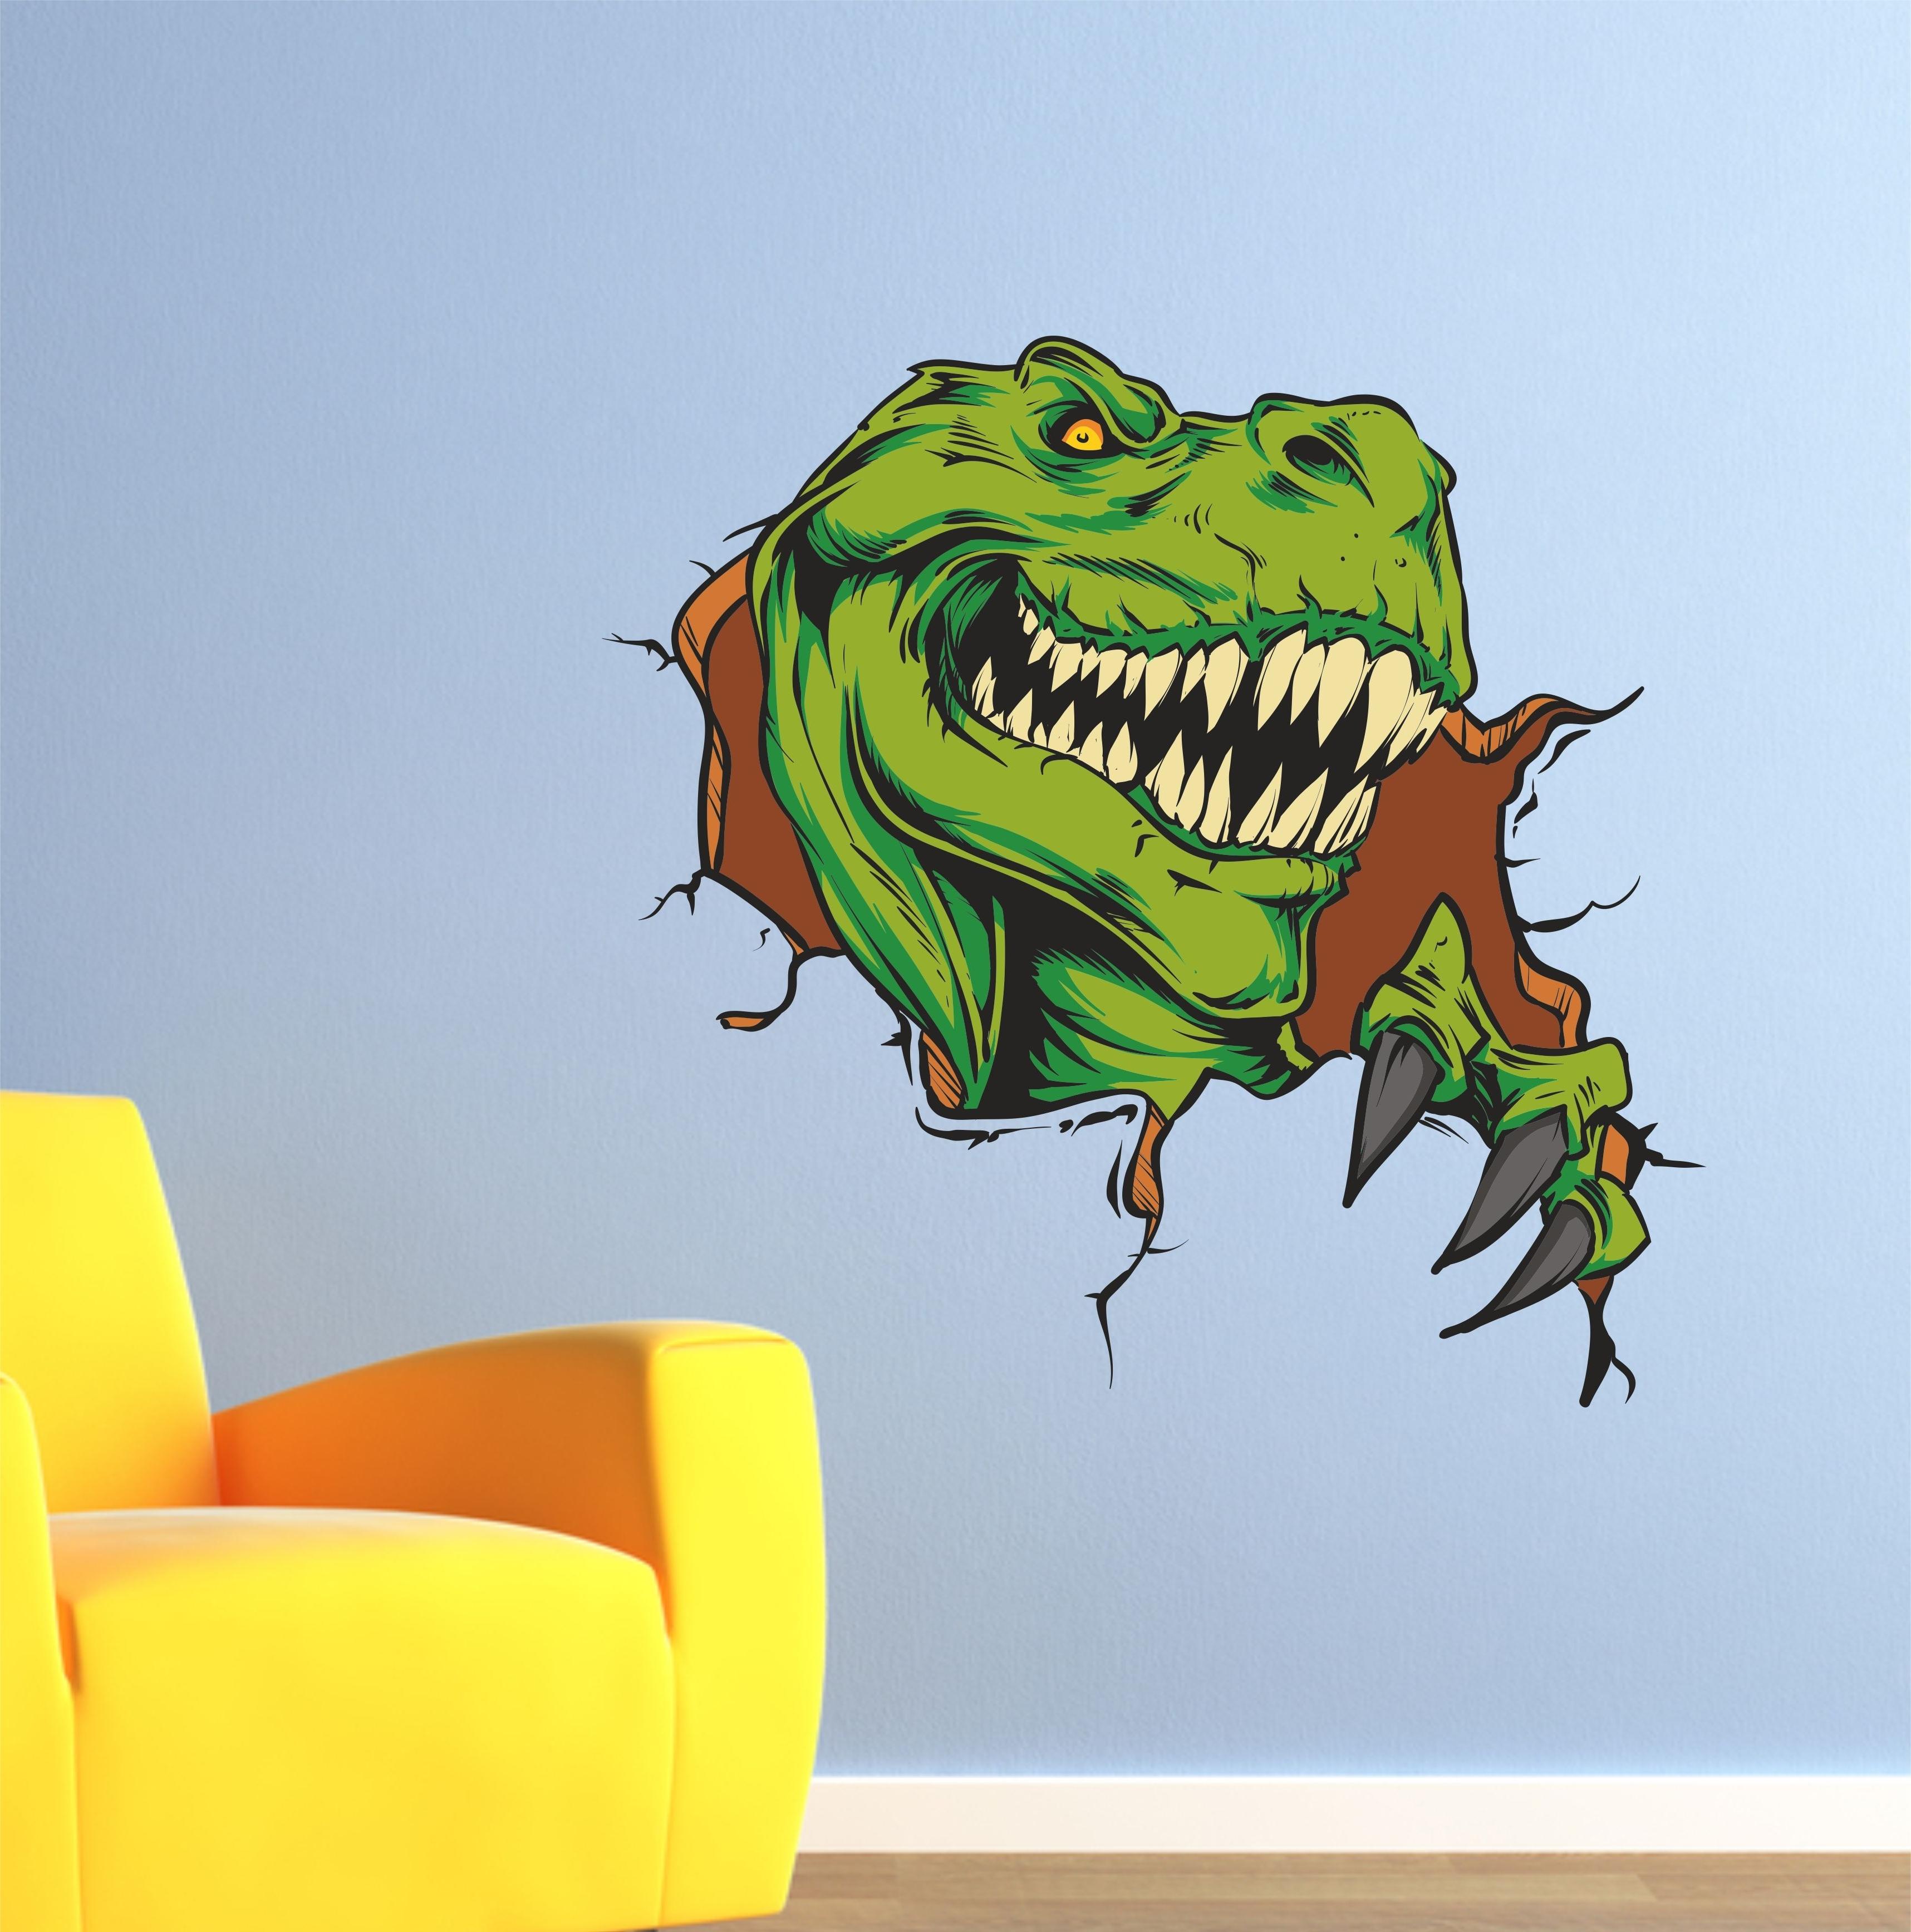 Dinosaur Wall Art In Most Popular The Grafix Studio (View 4 of 15)